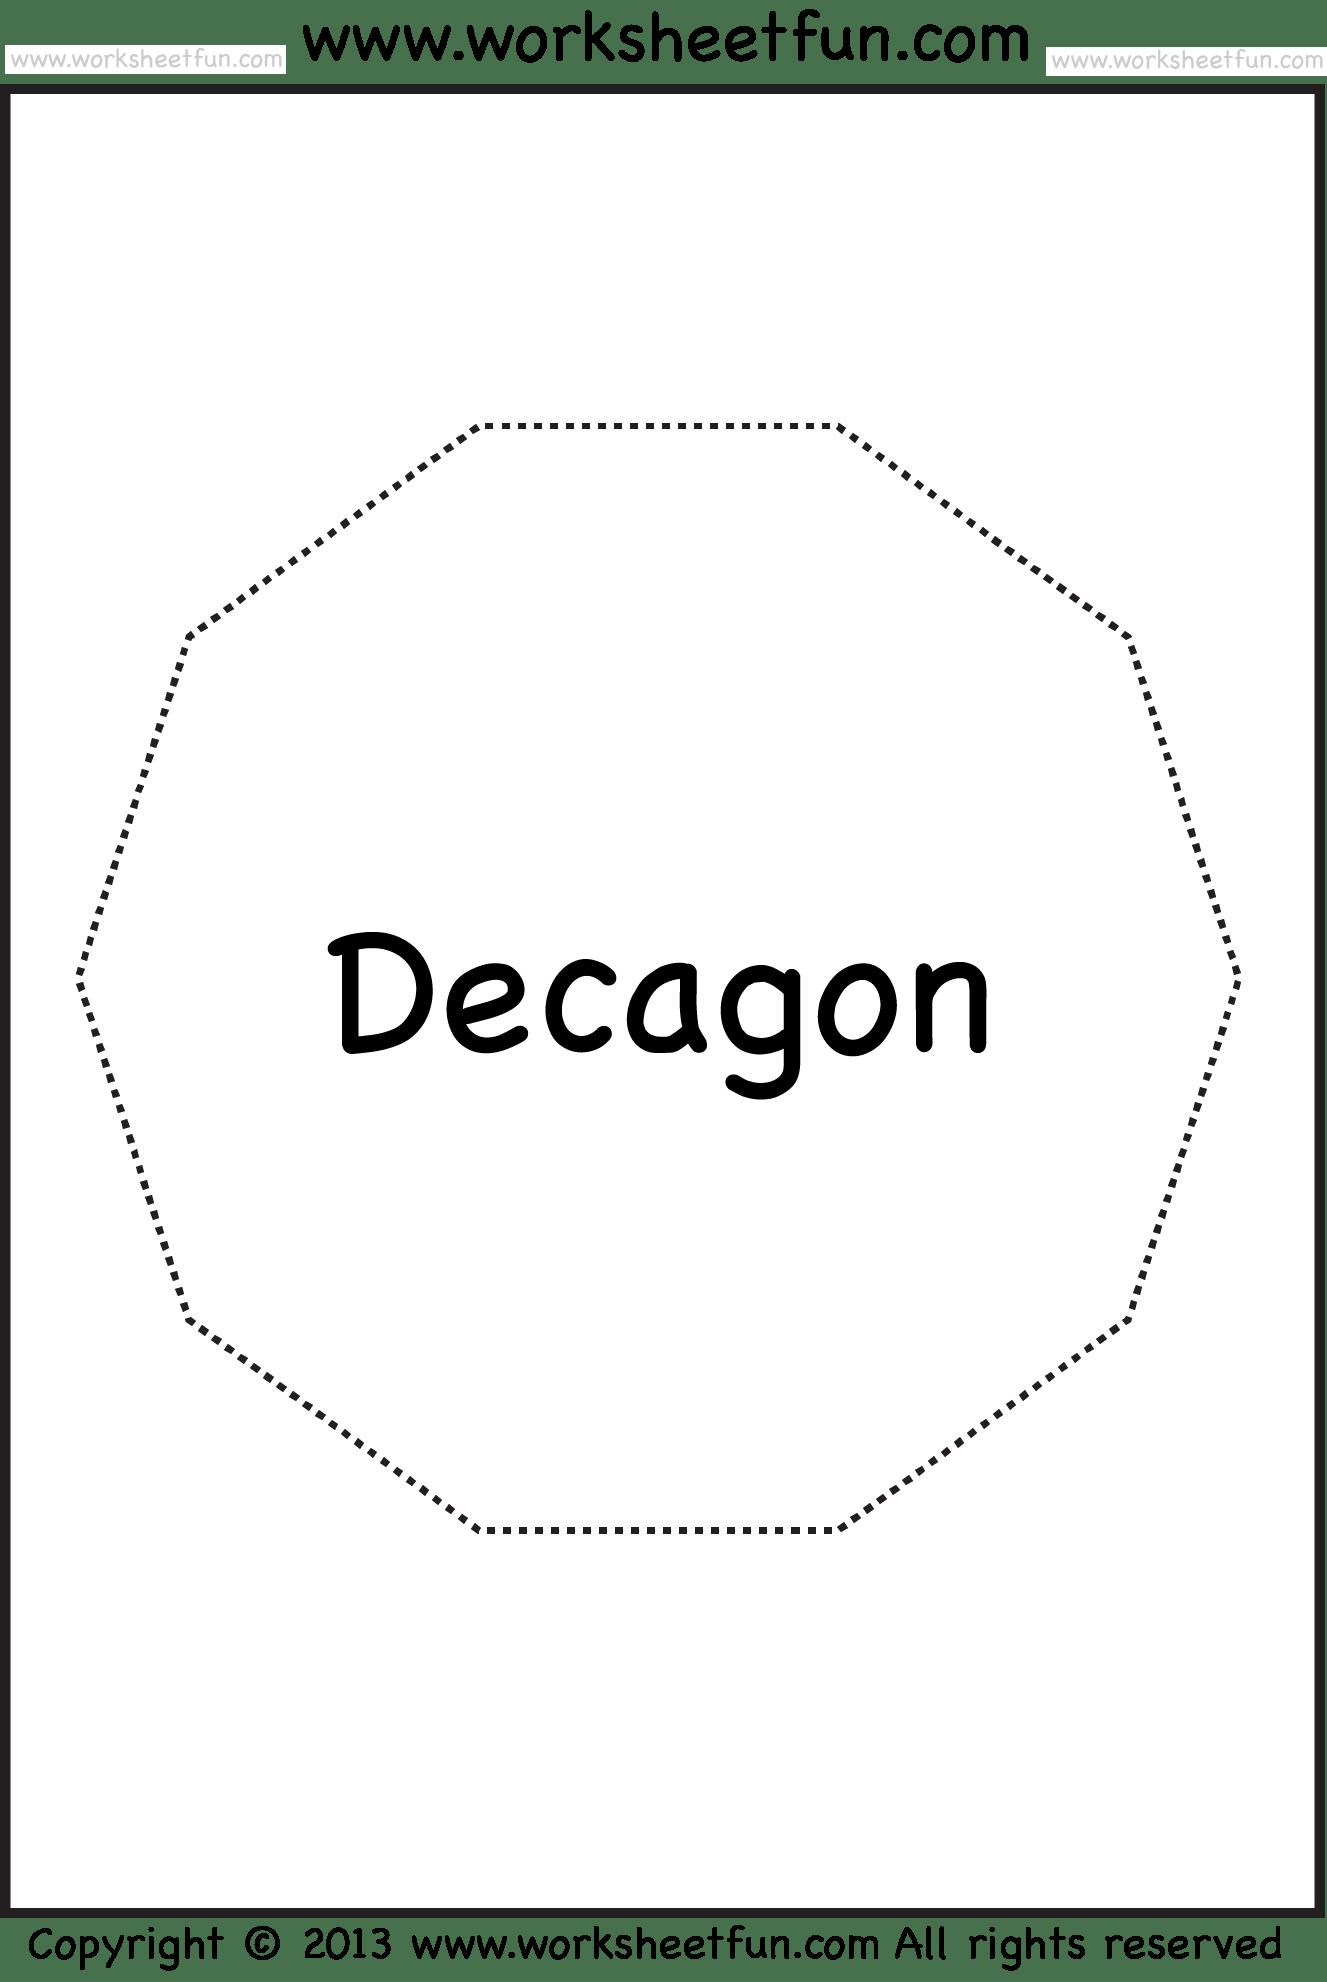 Shapes Pentagon Hexagon Heptagon Octagon Nonagon Decagon 13 Worksheets Free Printable